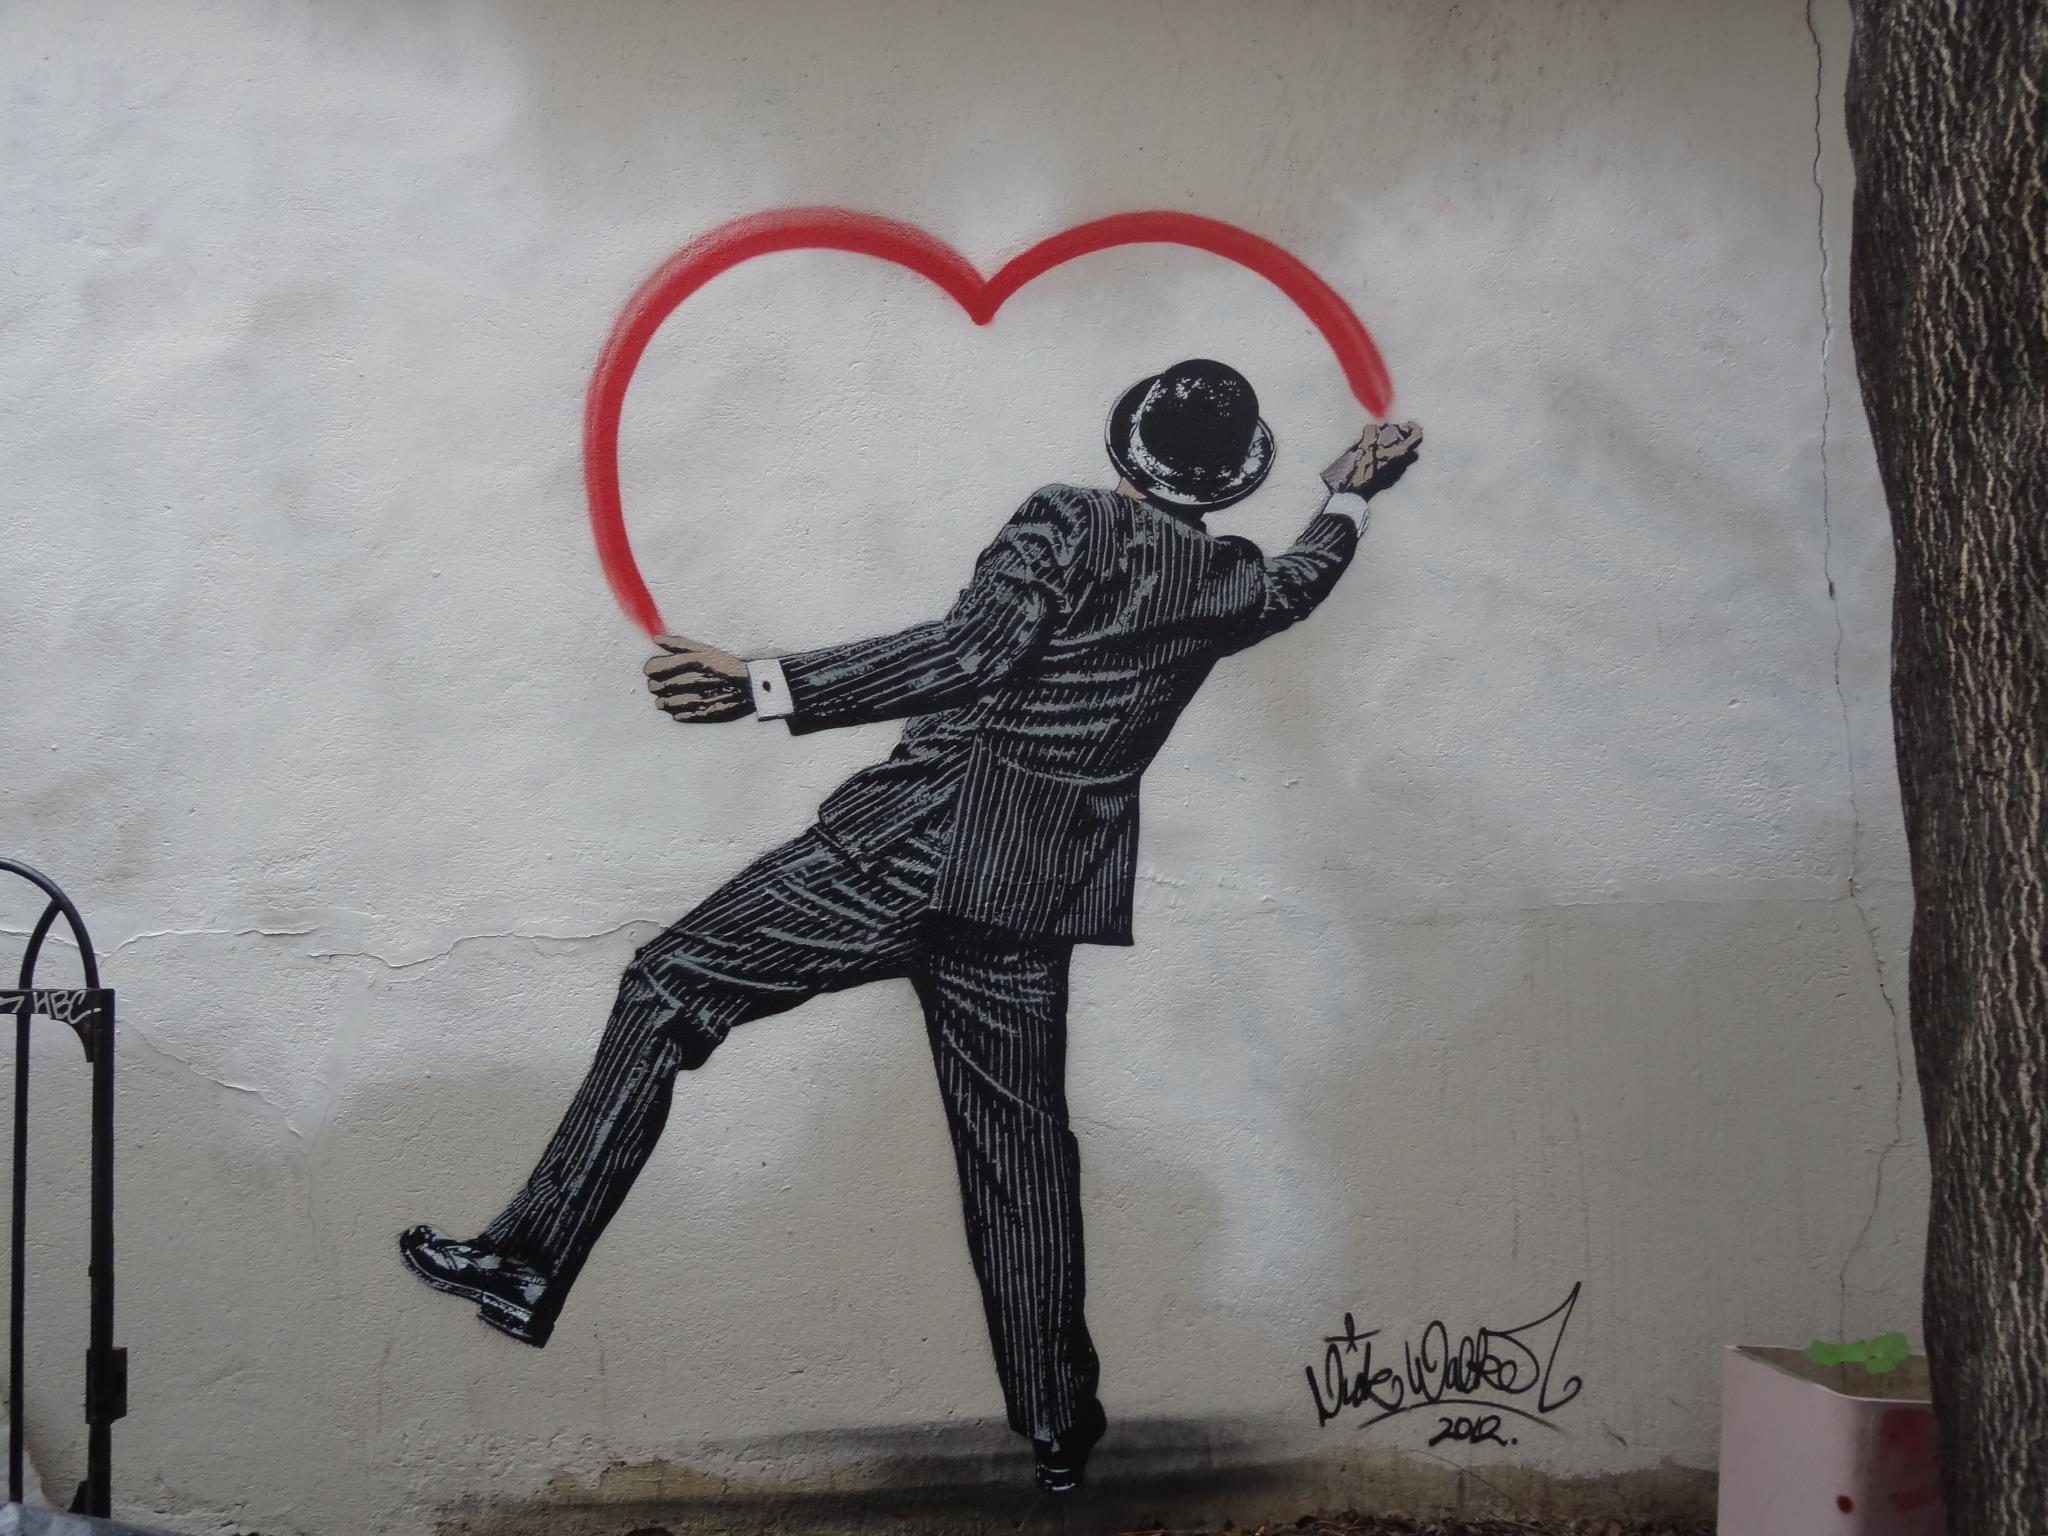 Thanks to Street Art Paris for the photo!